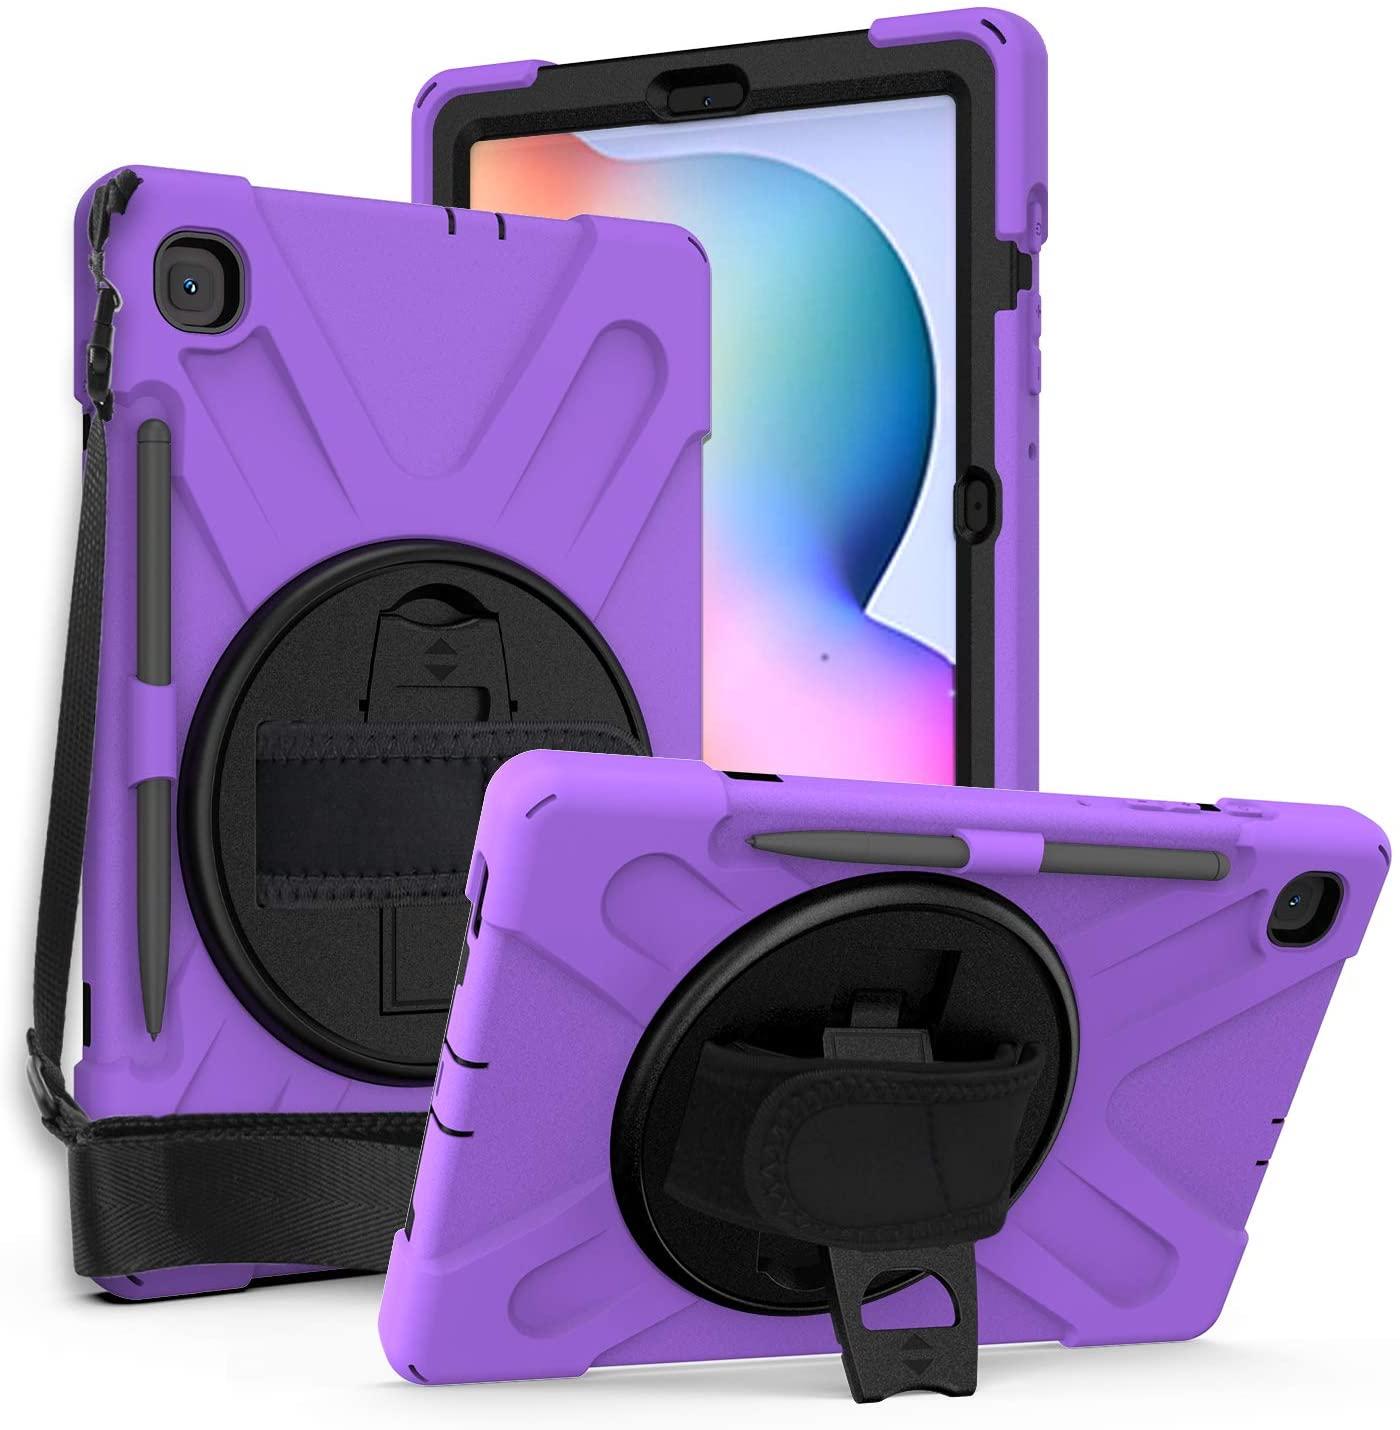 Galaxy Tab S6 Lite 10.4 2020 P610, KIQ Heavy Duty Shockproof Durable Case, Kickstand, Handstrap, Carrying Shoulderstrap Sling for Samsung Galaxy Tab S6 Lite 10.4 P610 (Shield Purple)